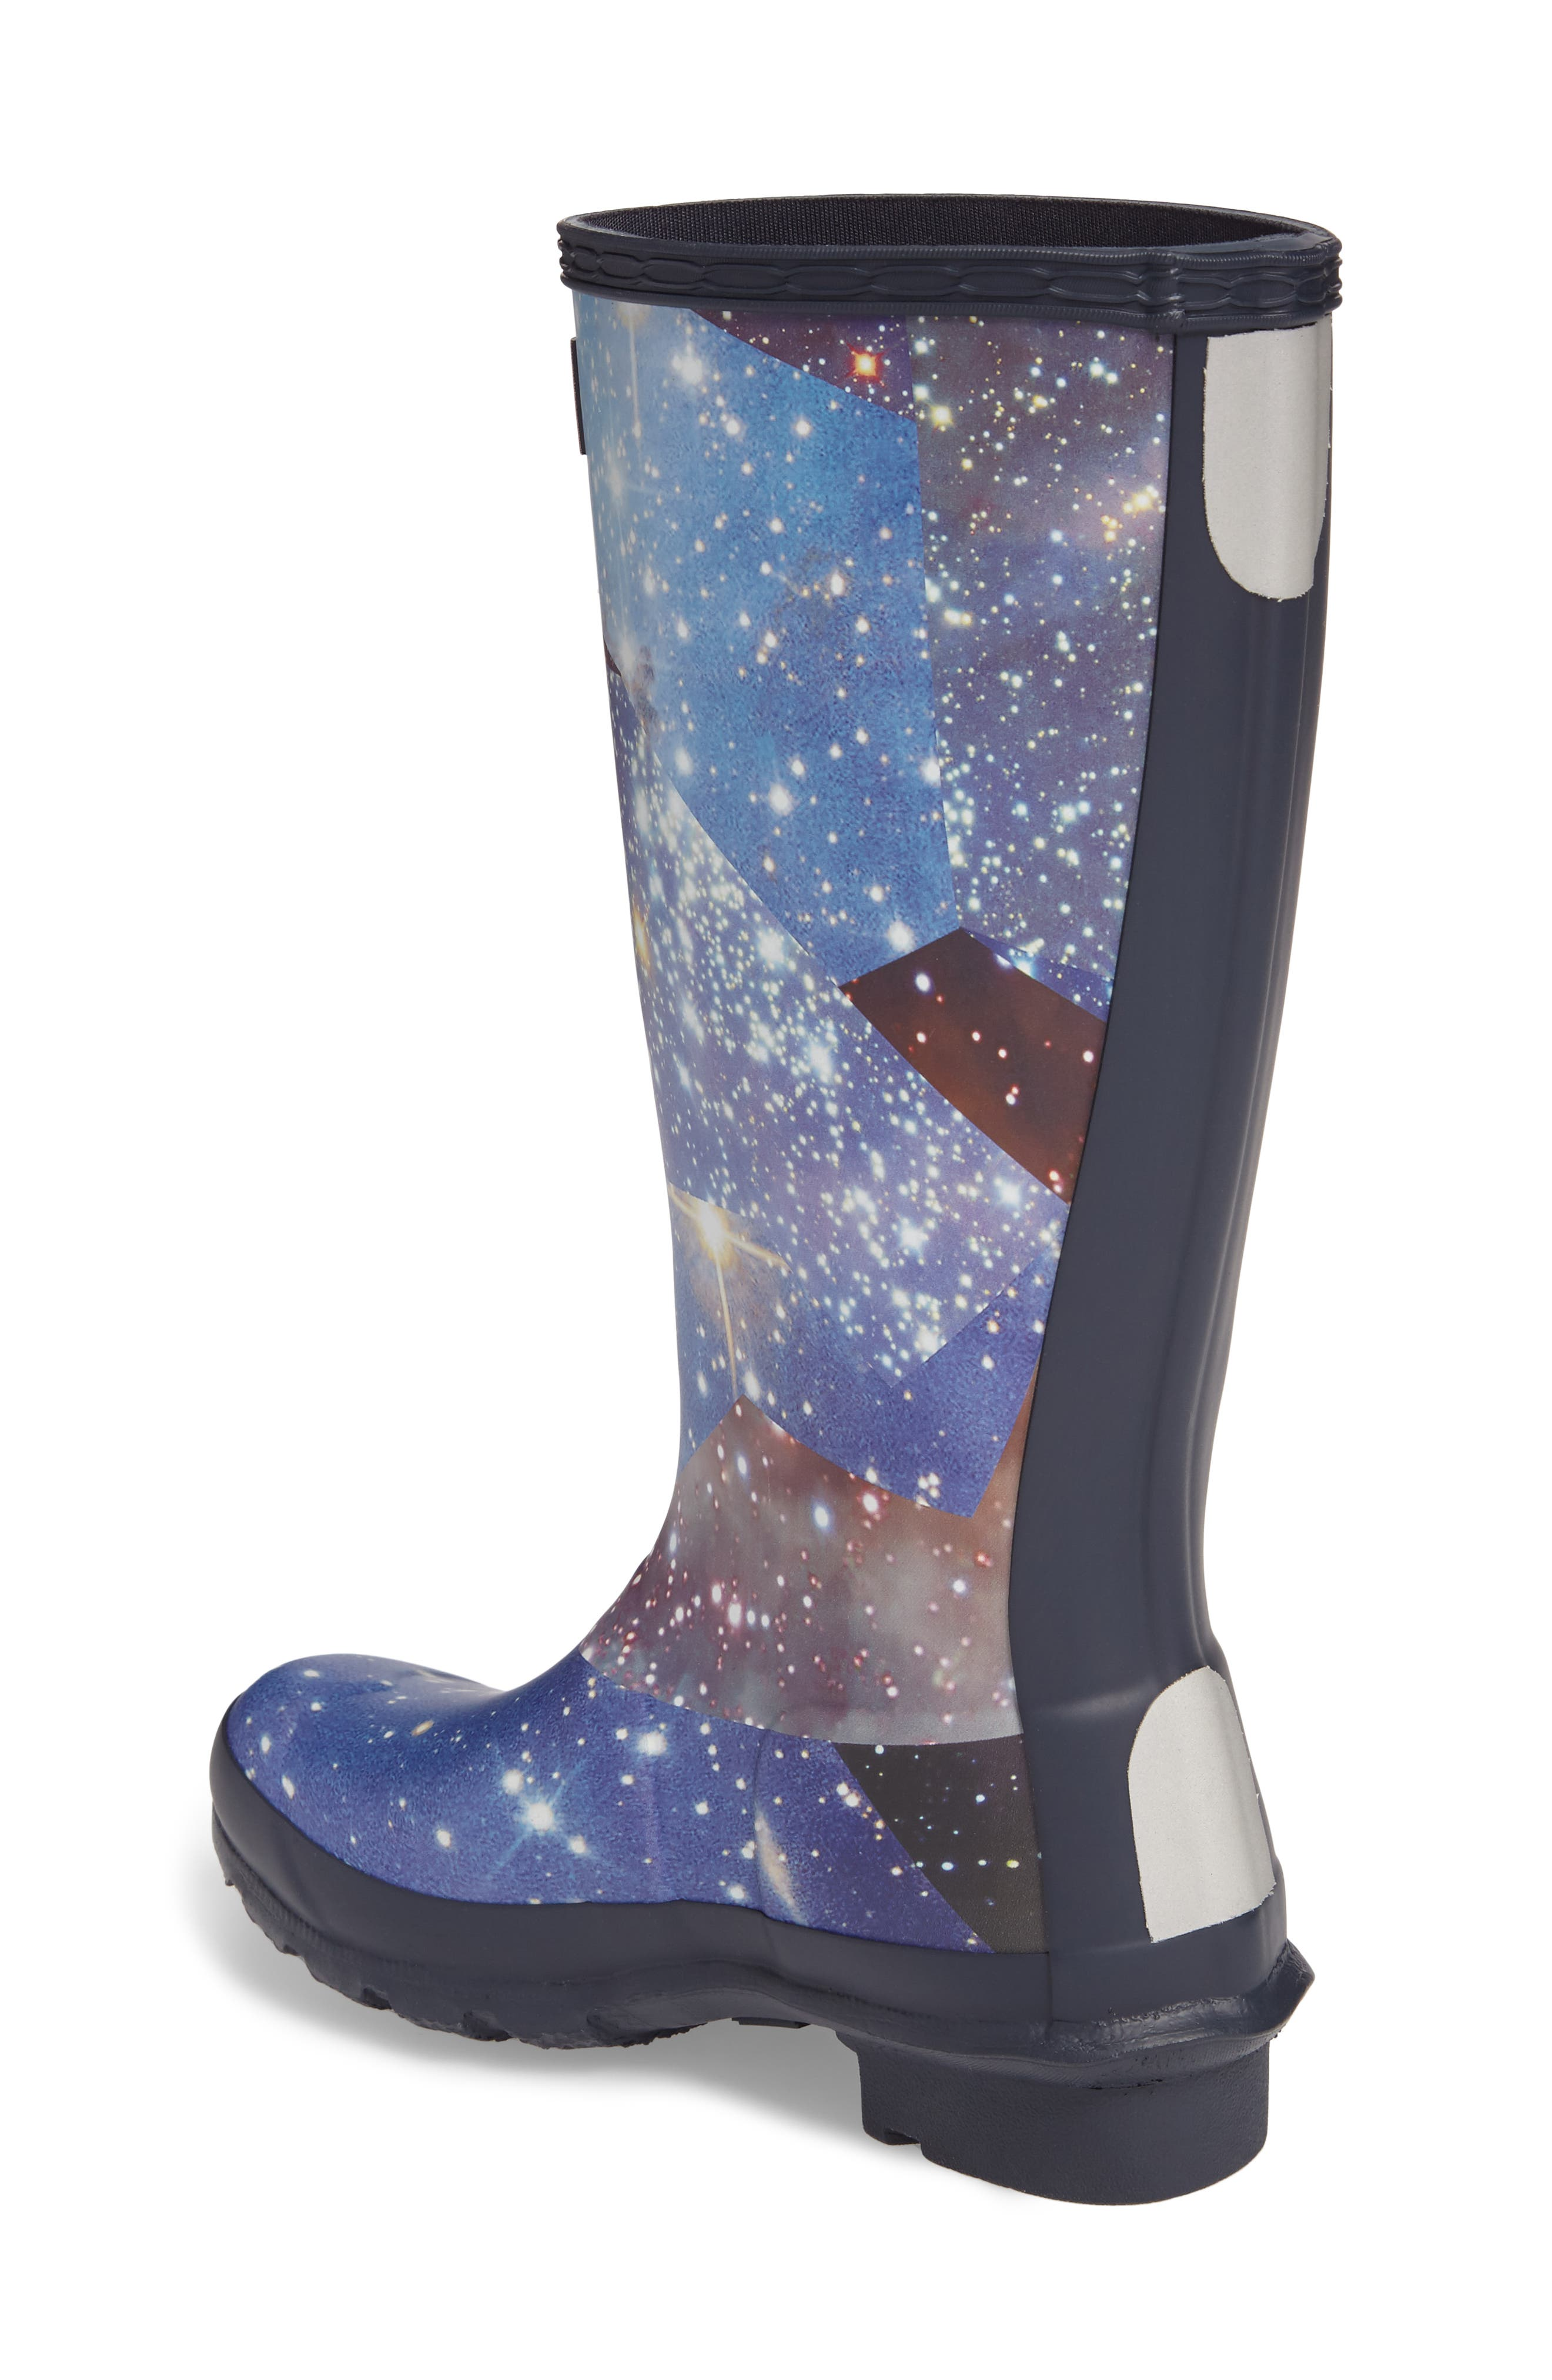 Space Camo Waterproof Rain Boot,                             Alternate thumbnail 2, color,